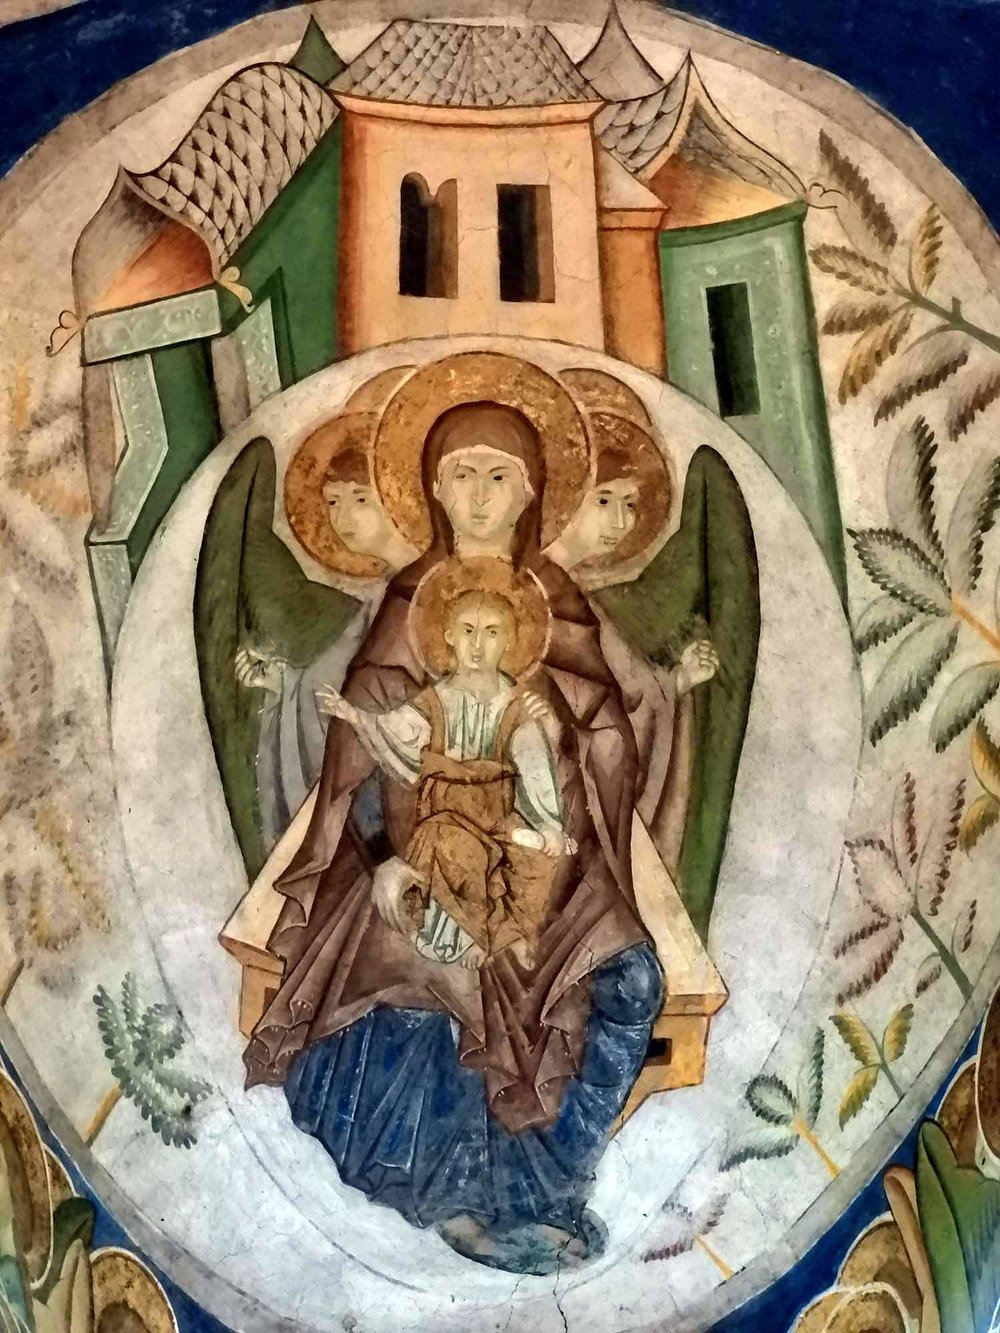 romania-bucovina-arbore-painted-monasteries (4).jpg